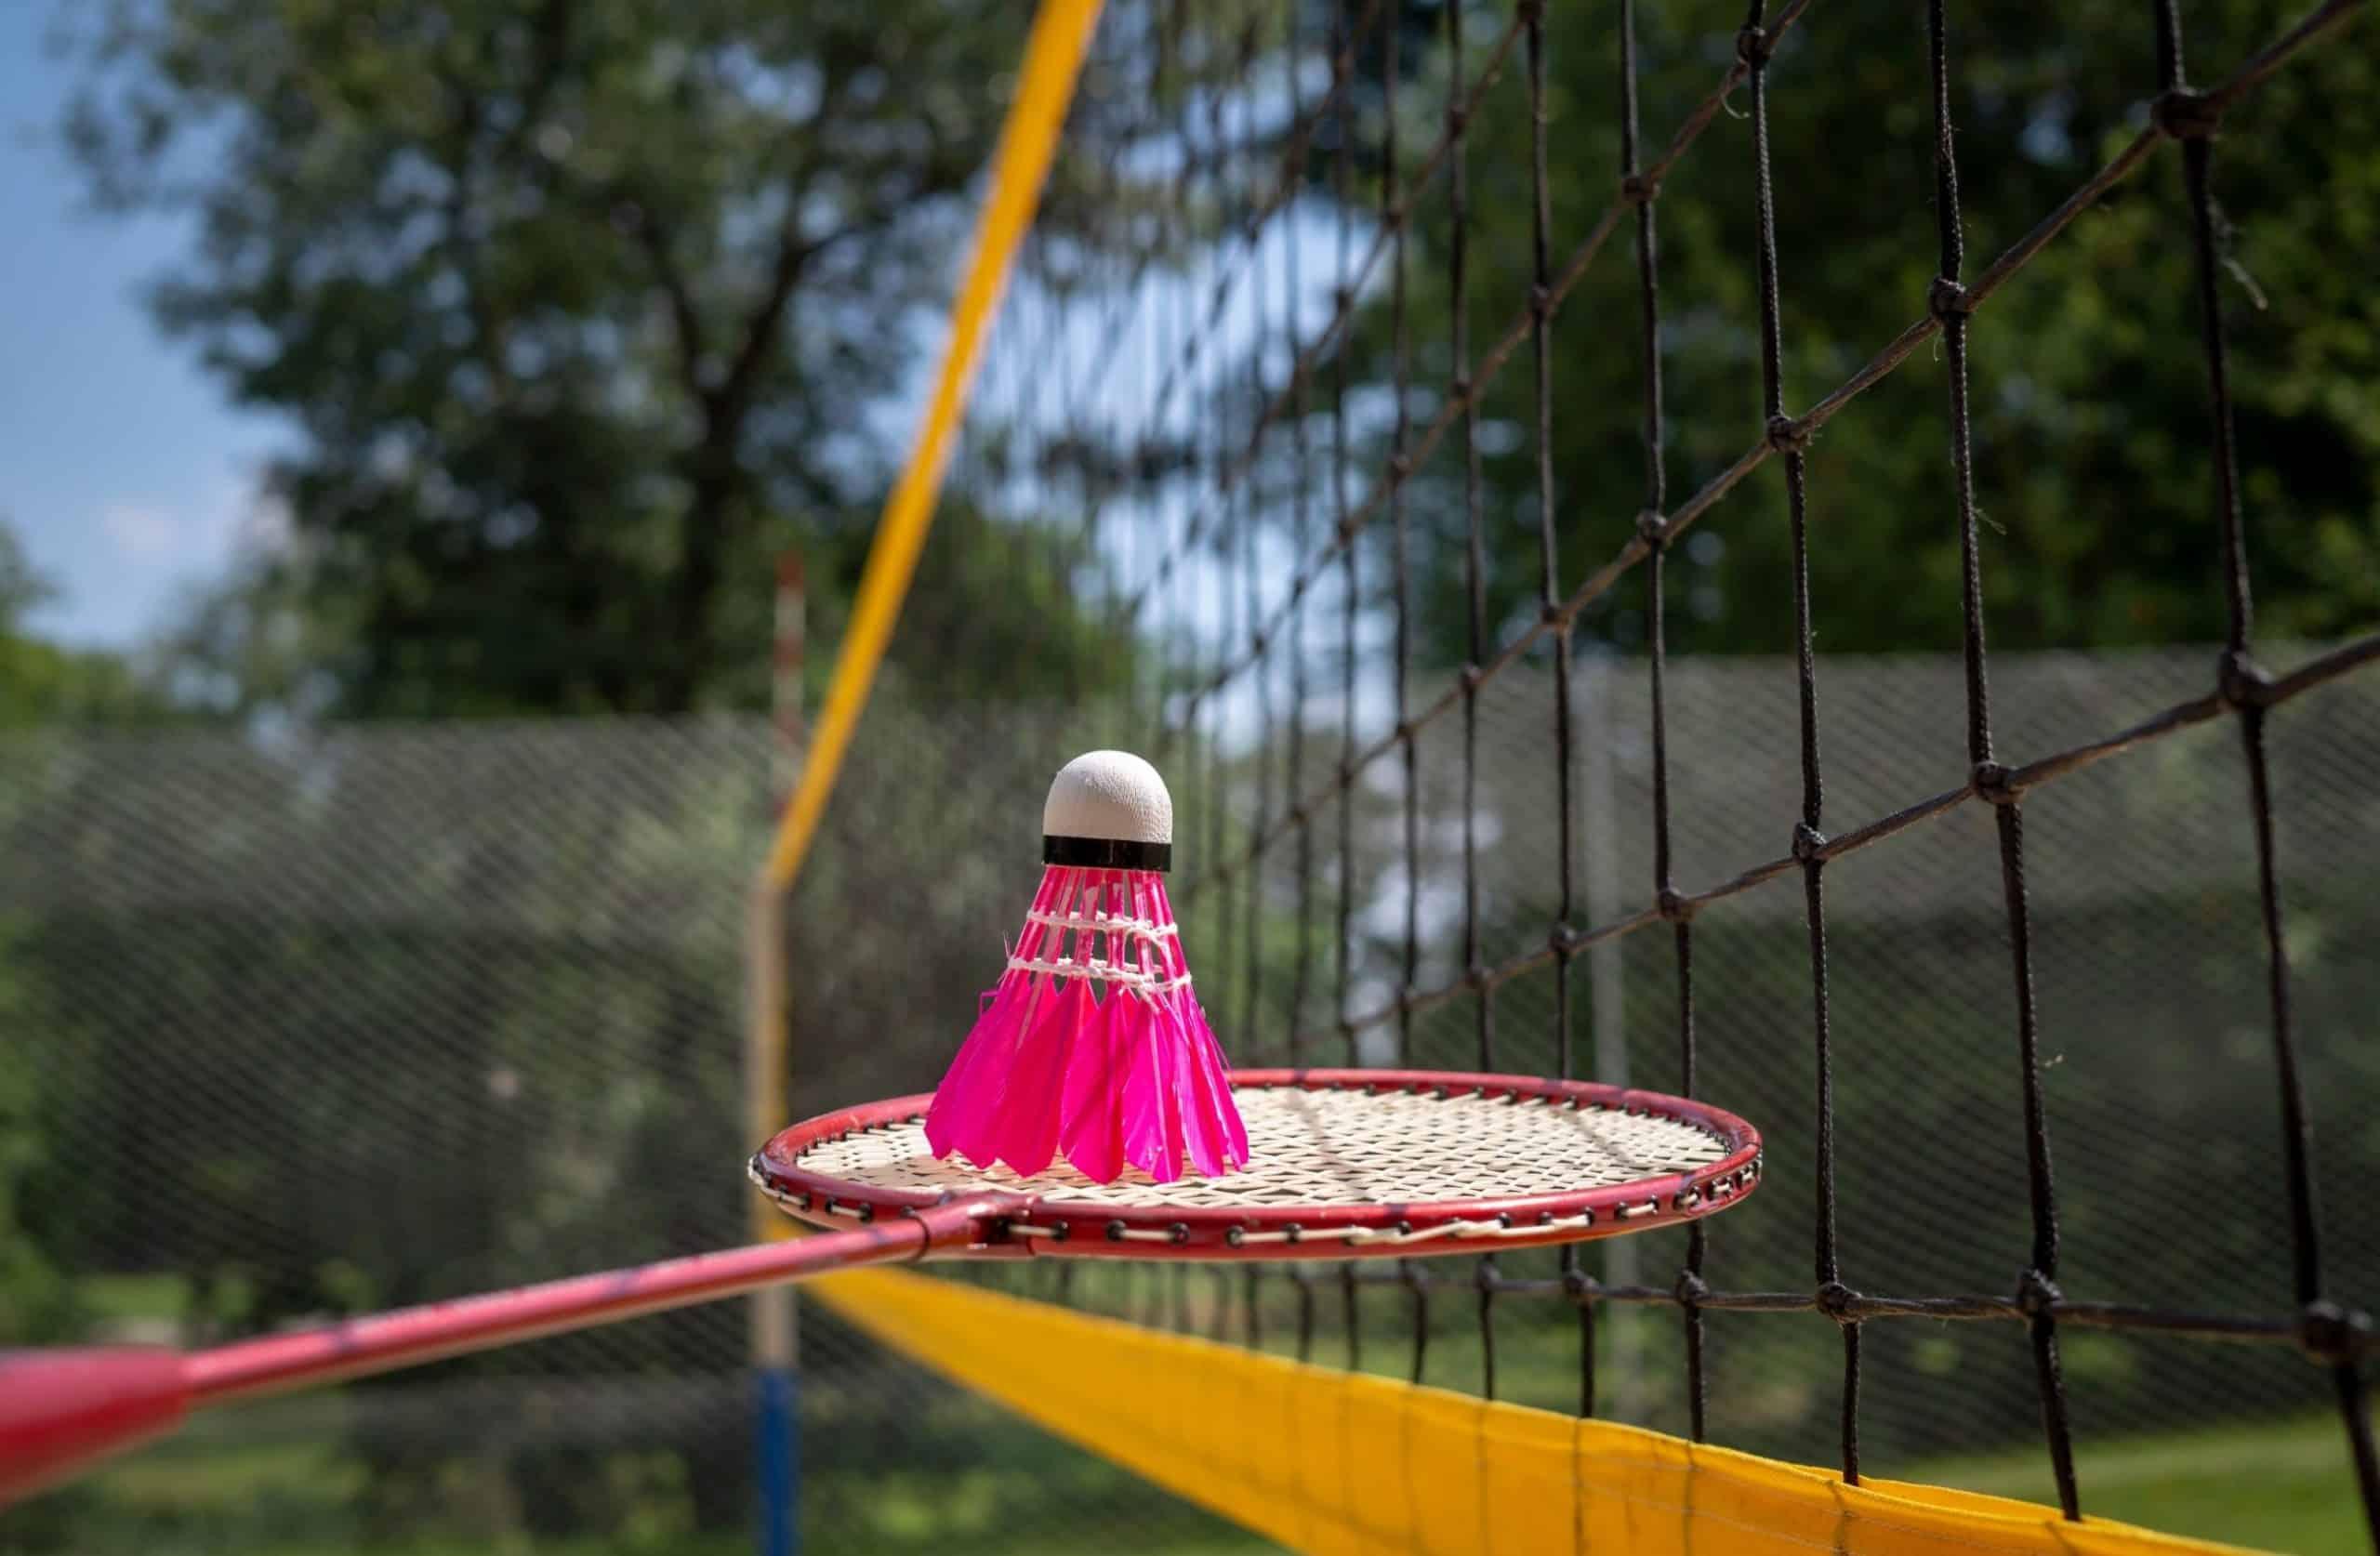 Badminton racket & shuttlecock by portable badminton net set